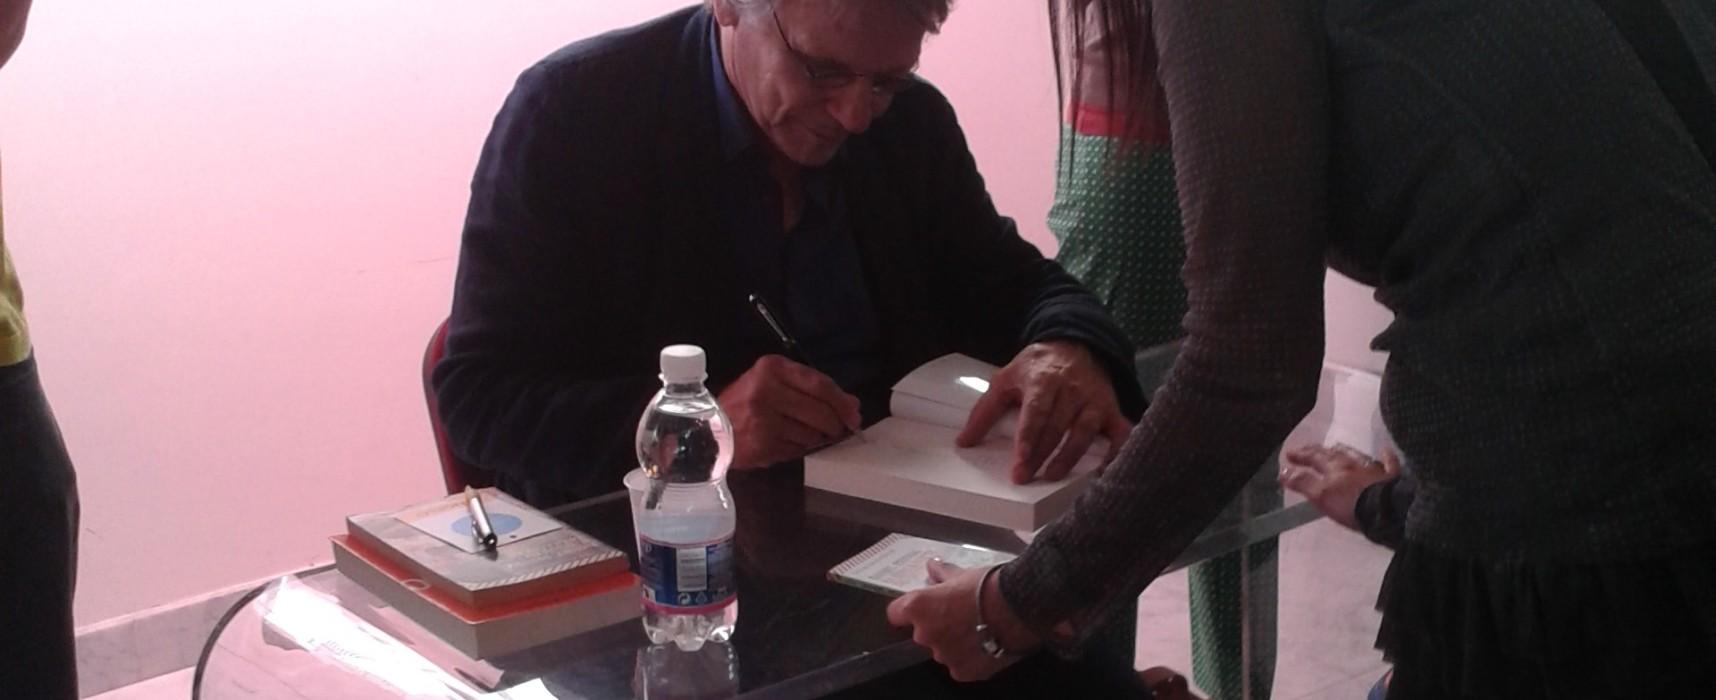 En plein di autori, Pennac si aggiunge a Pordenonelegge